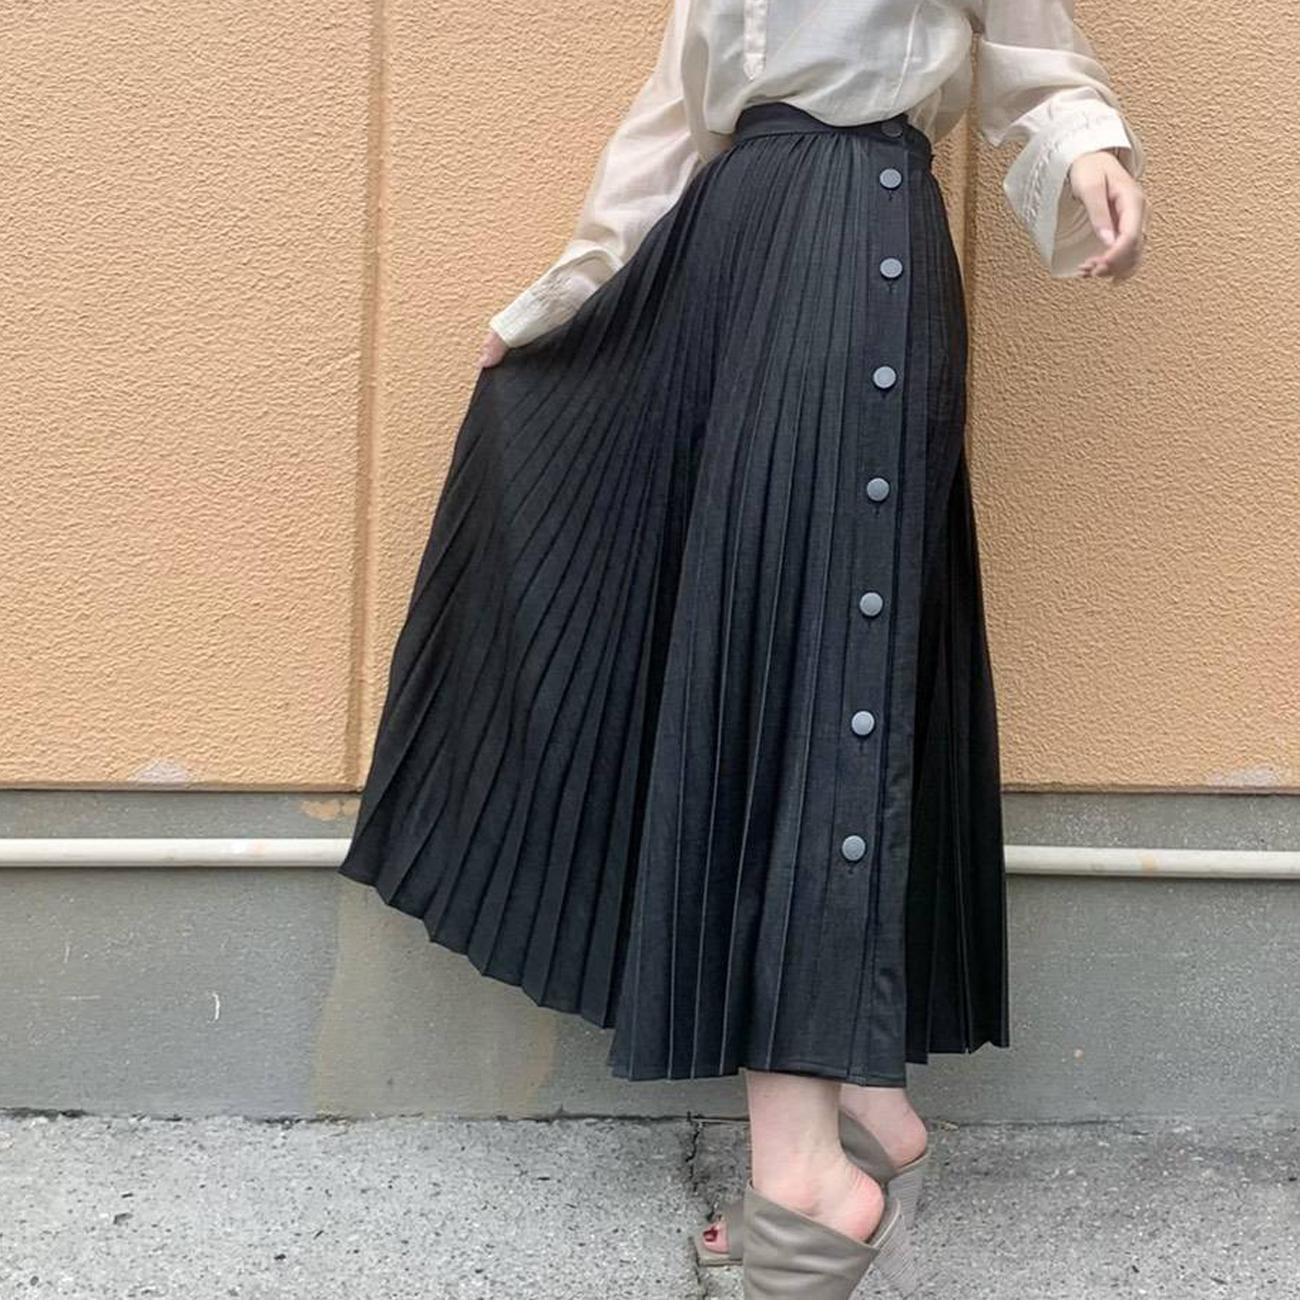 MARIED'OR/マリードール サイドボタンプリーツスカート 25291